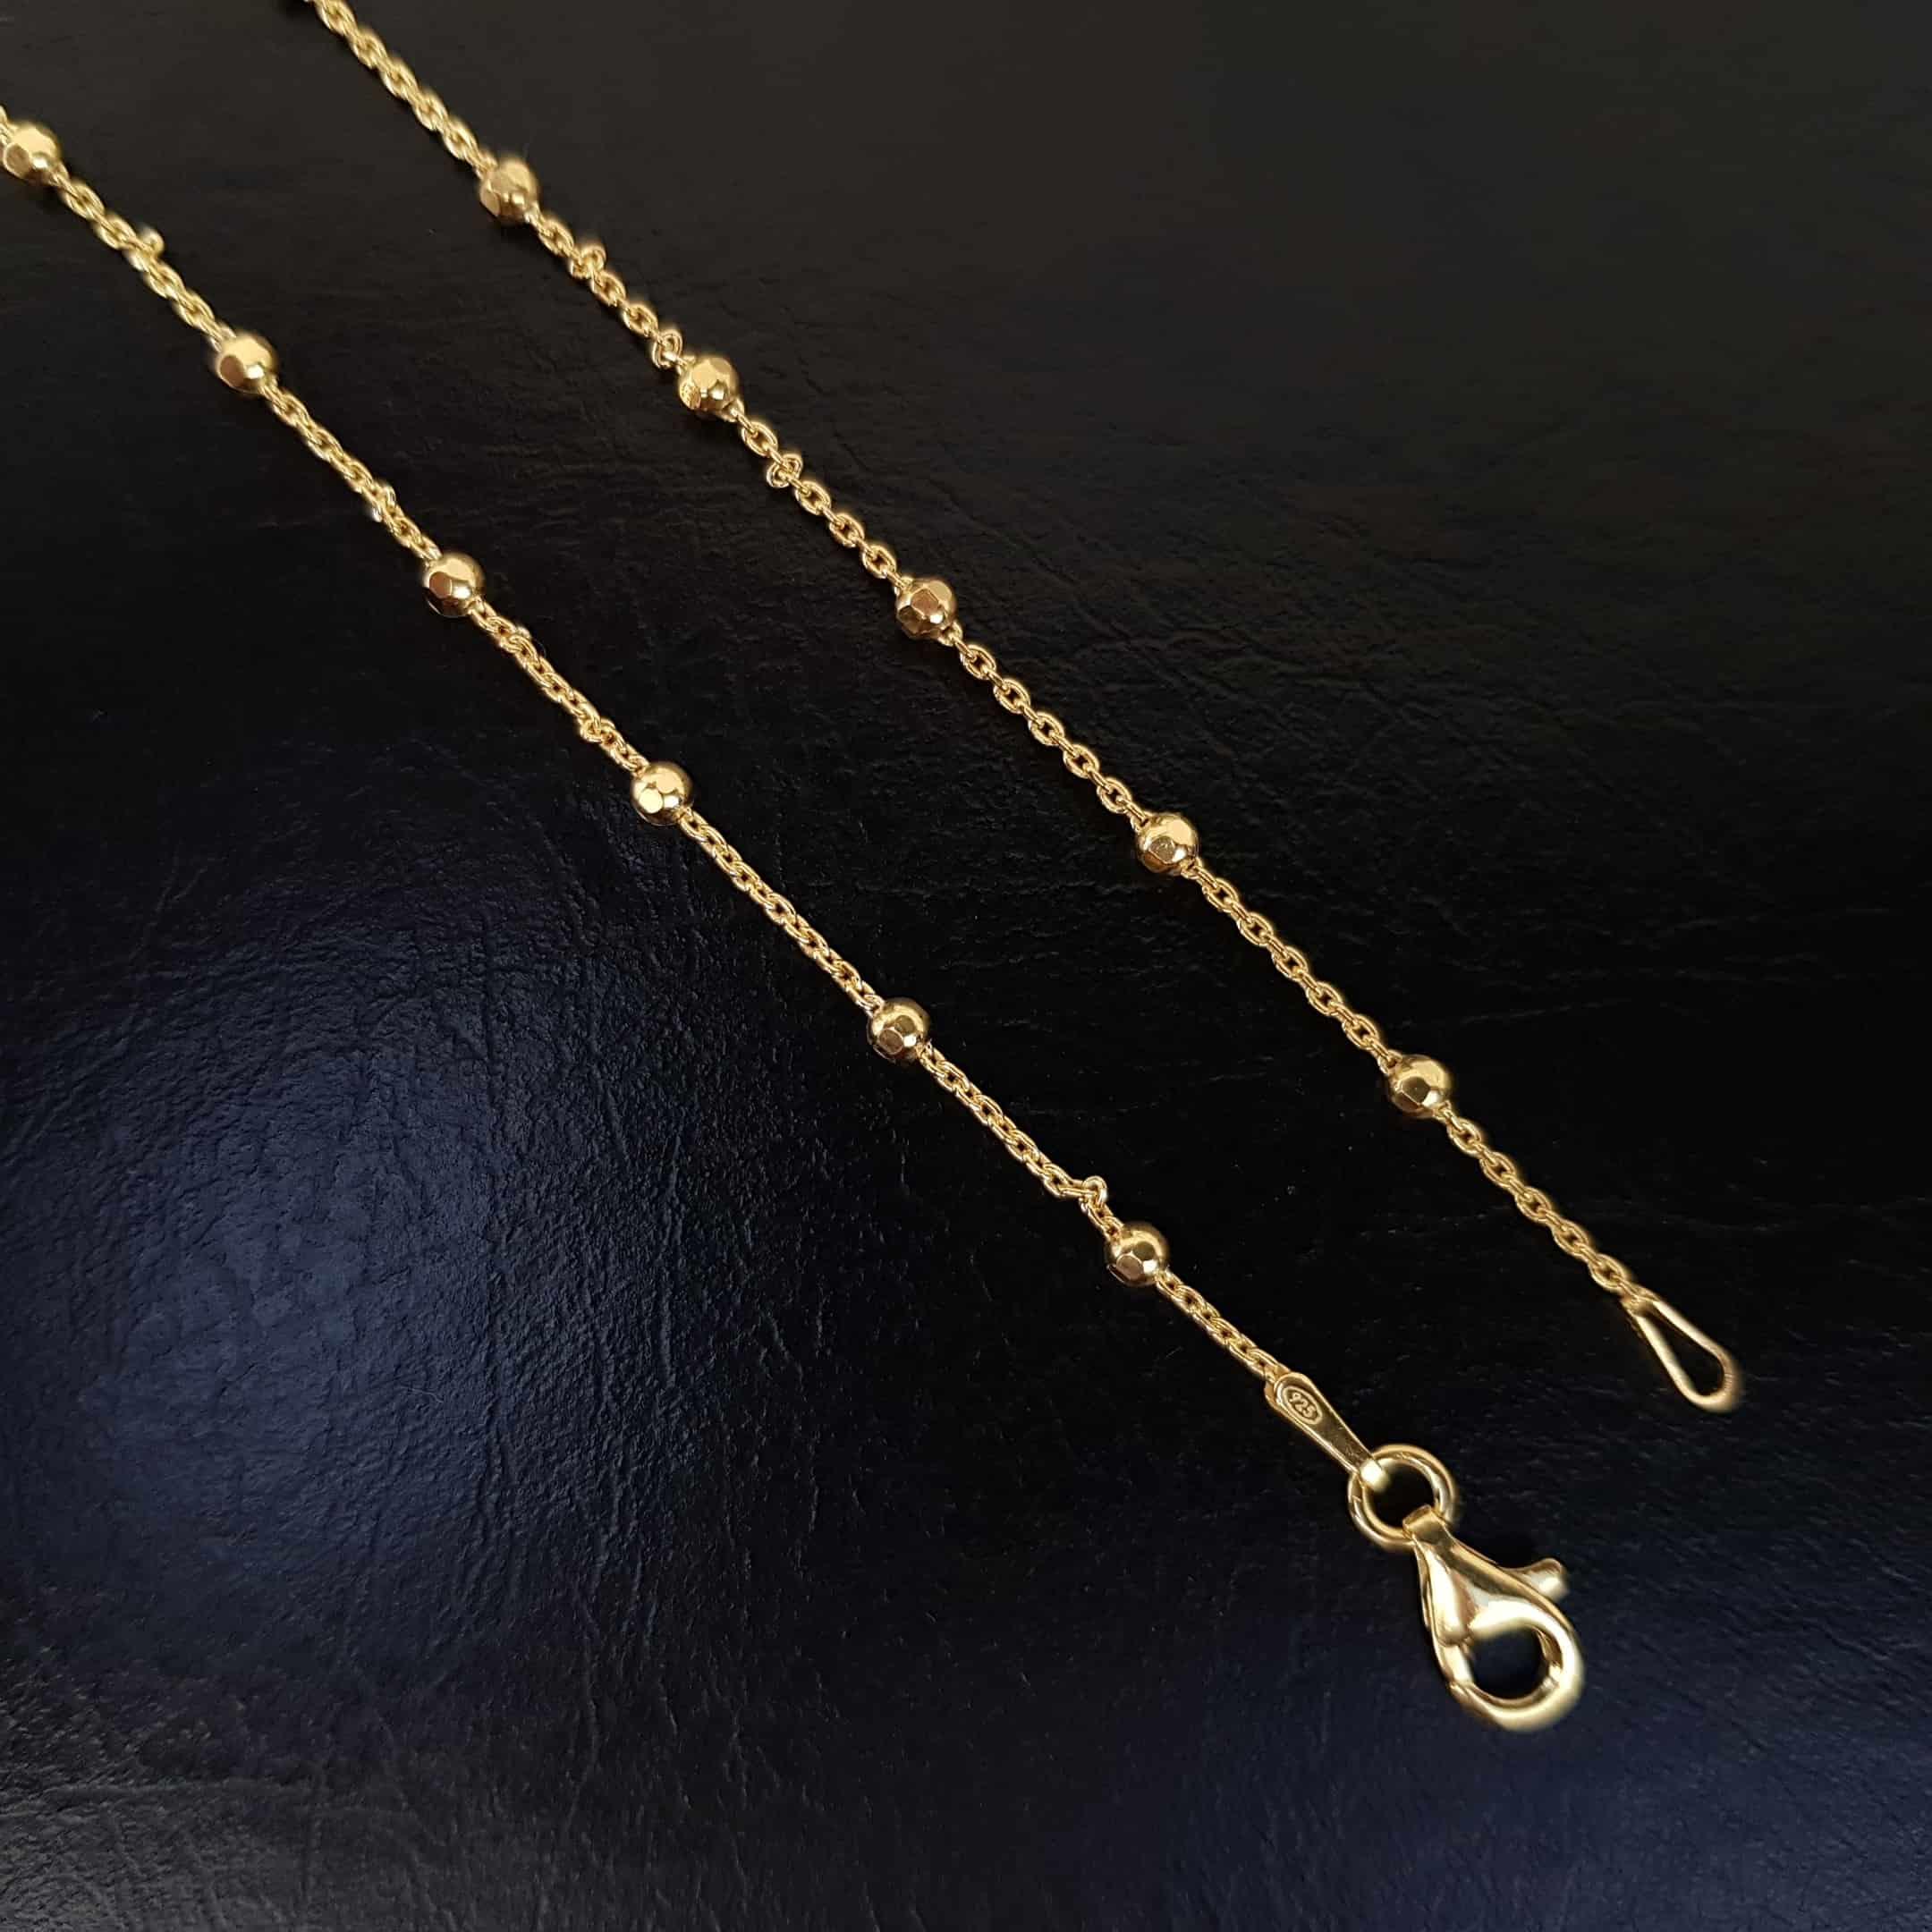 cadena de plata f35 chapada oro